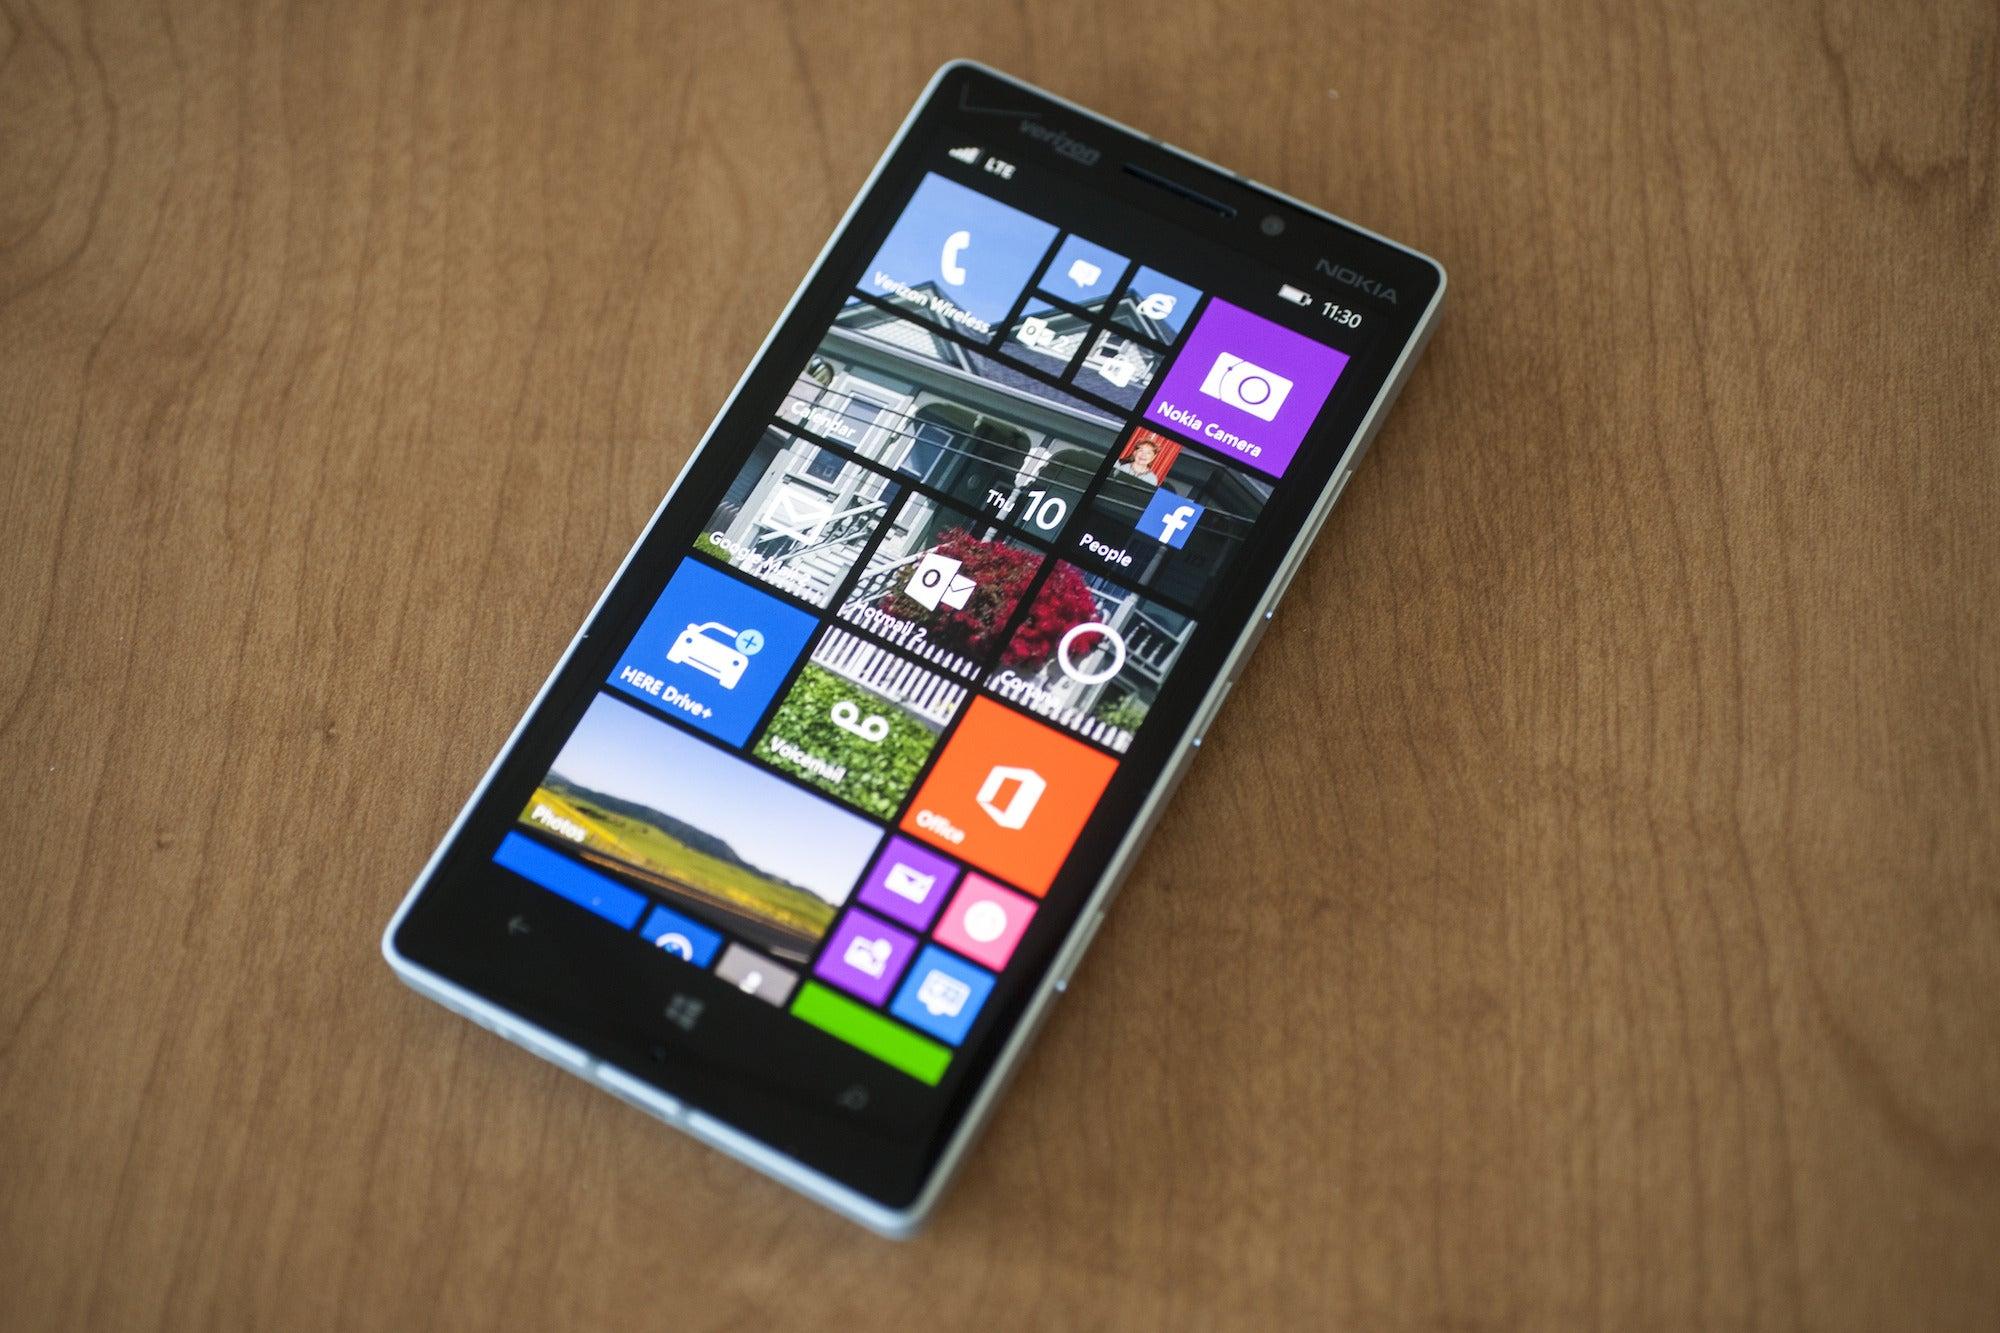 how to play m3u8 files on windows phone